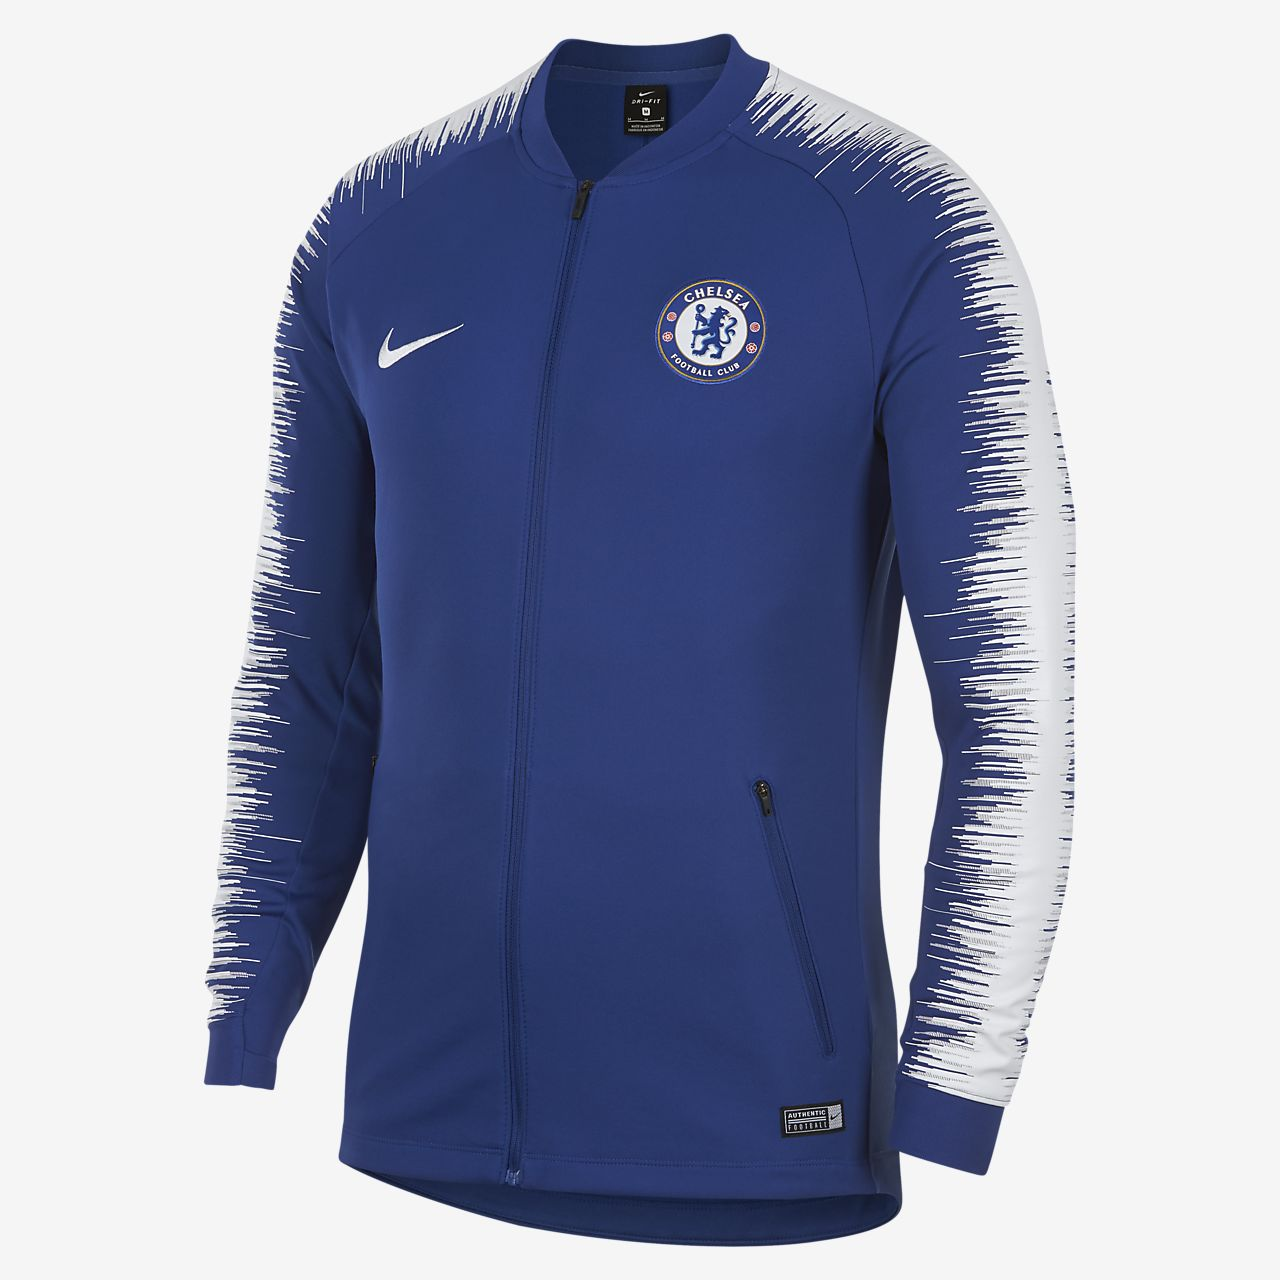 newest 9a3fd 65852 Chelsea FC Anthem Men's Football Jacket